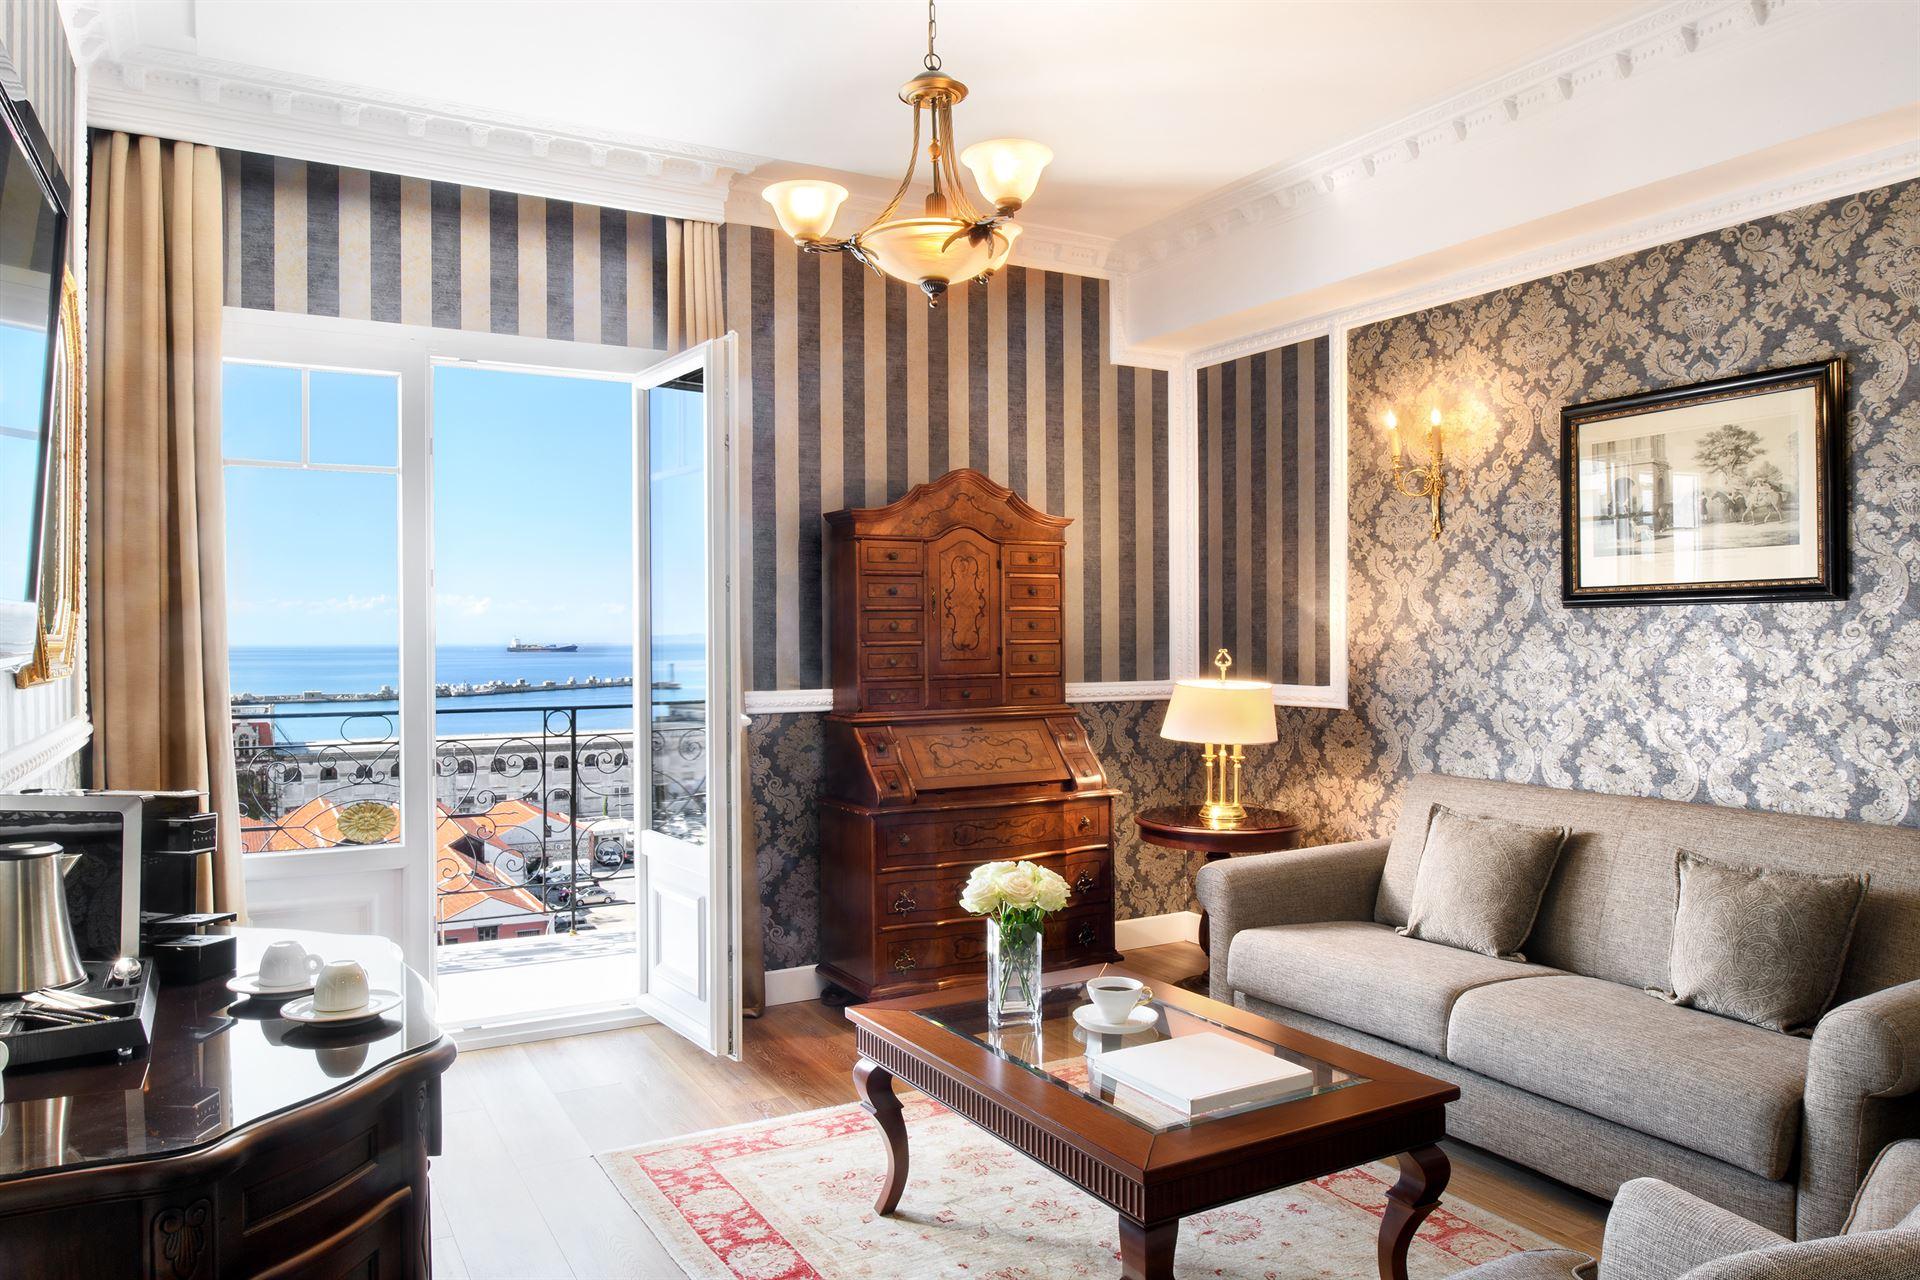 Mediterranean Palace Hotel: Executive Suite